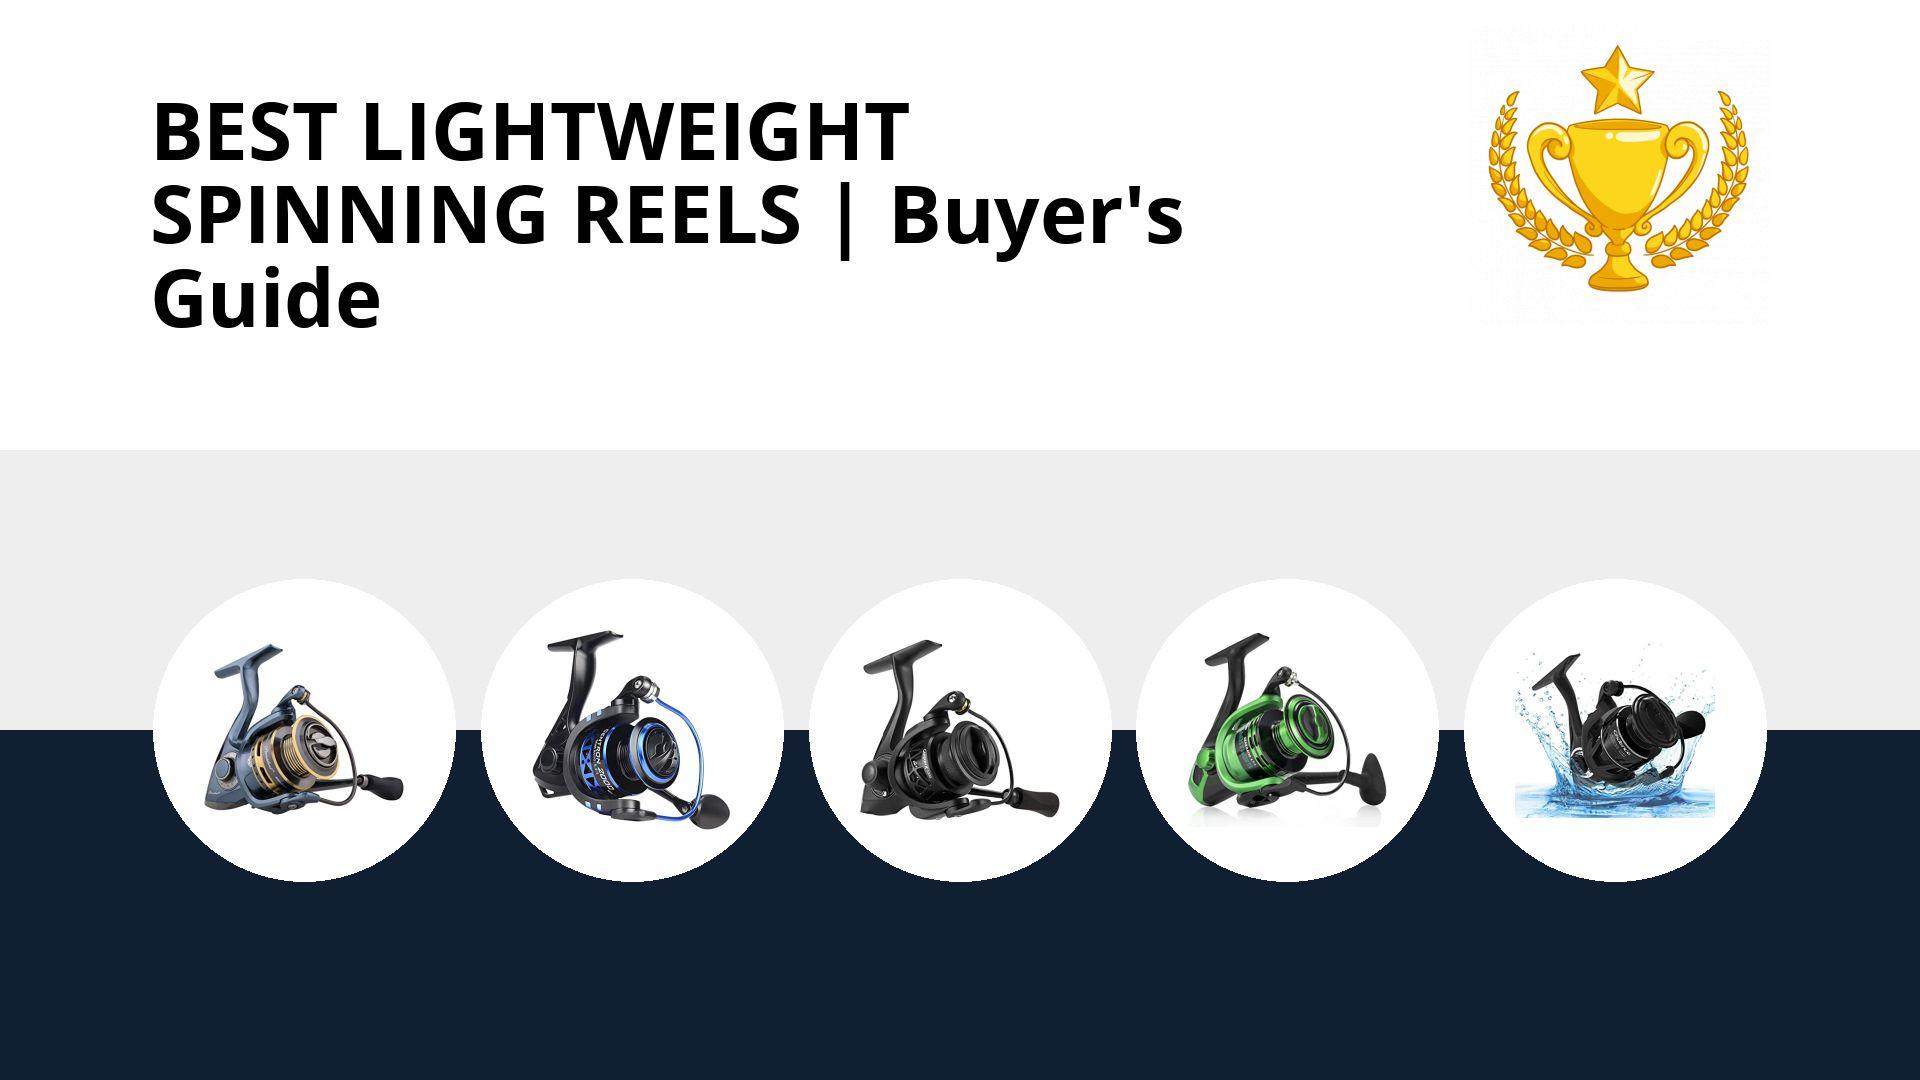 Best Lightweight Spinning Reels: image